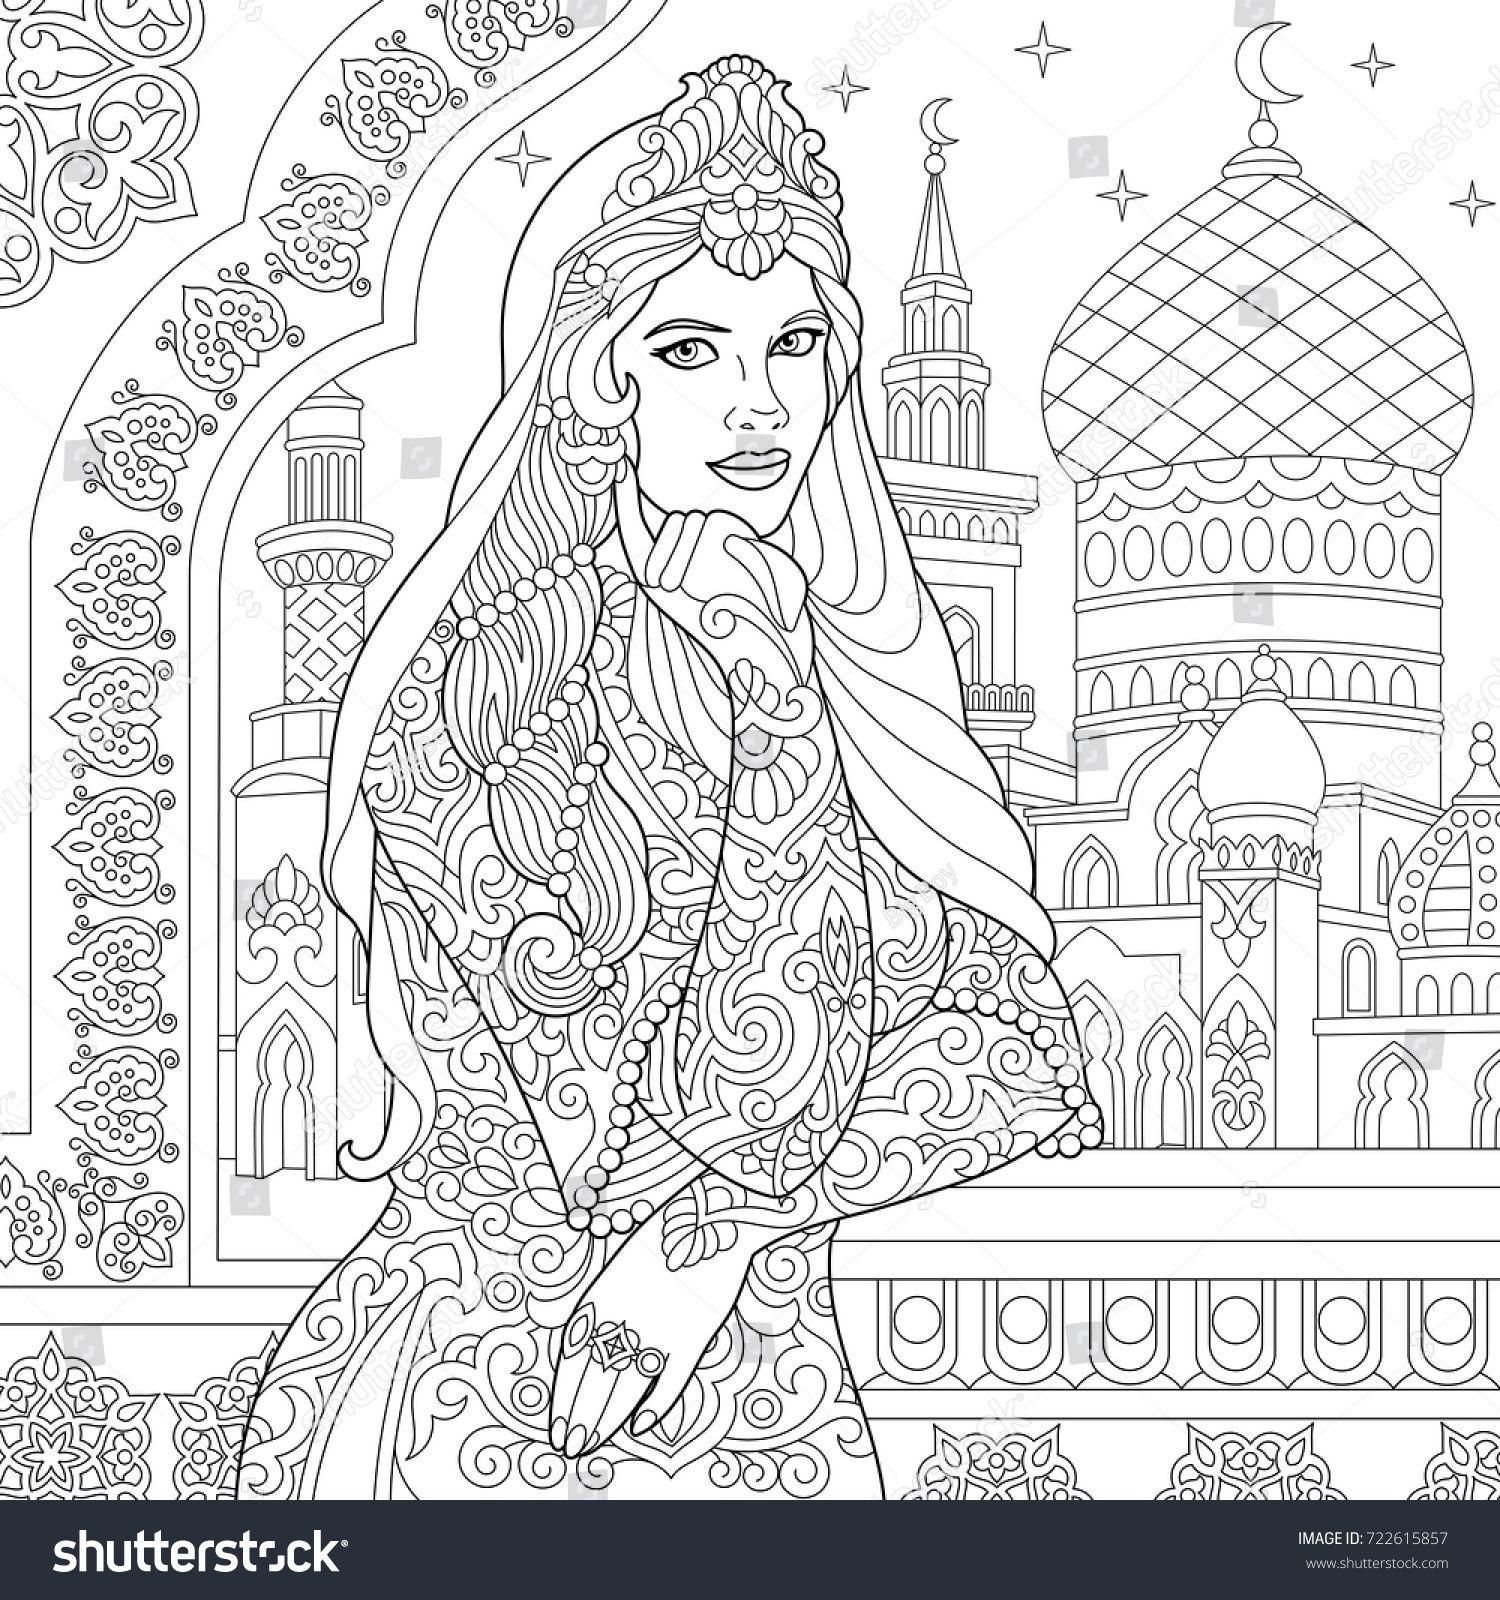 Coloring Page Of Turkish Woman Islamic Filigree Decor Arabic